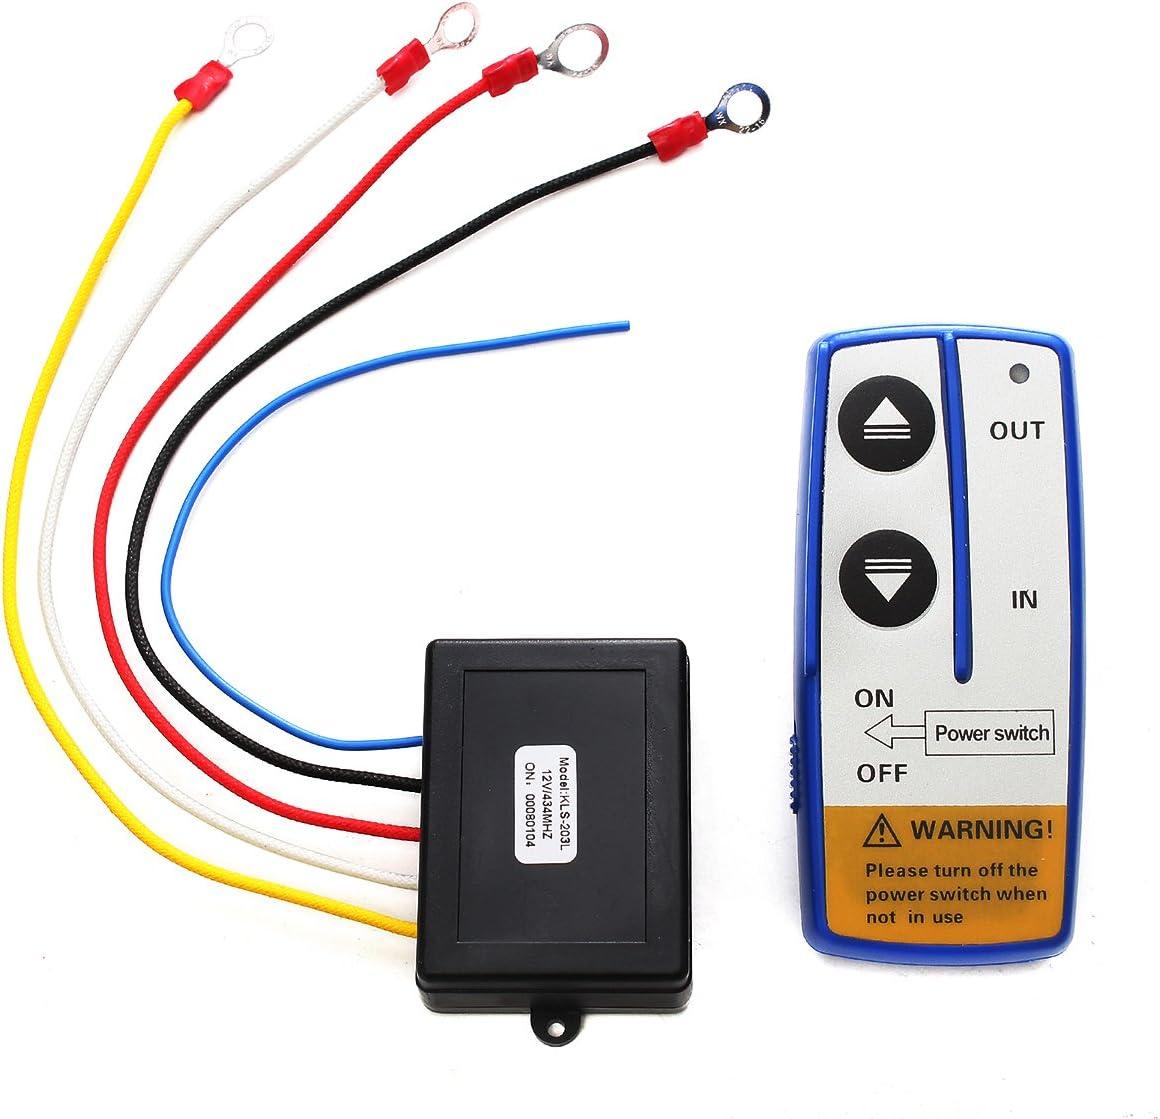 12V Electric Winch Wireless Remote Control and Receiver Kit for ATV UTV SUV 4X4 Vehicles OCPTY Remote Control